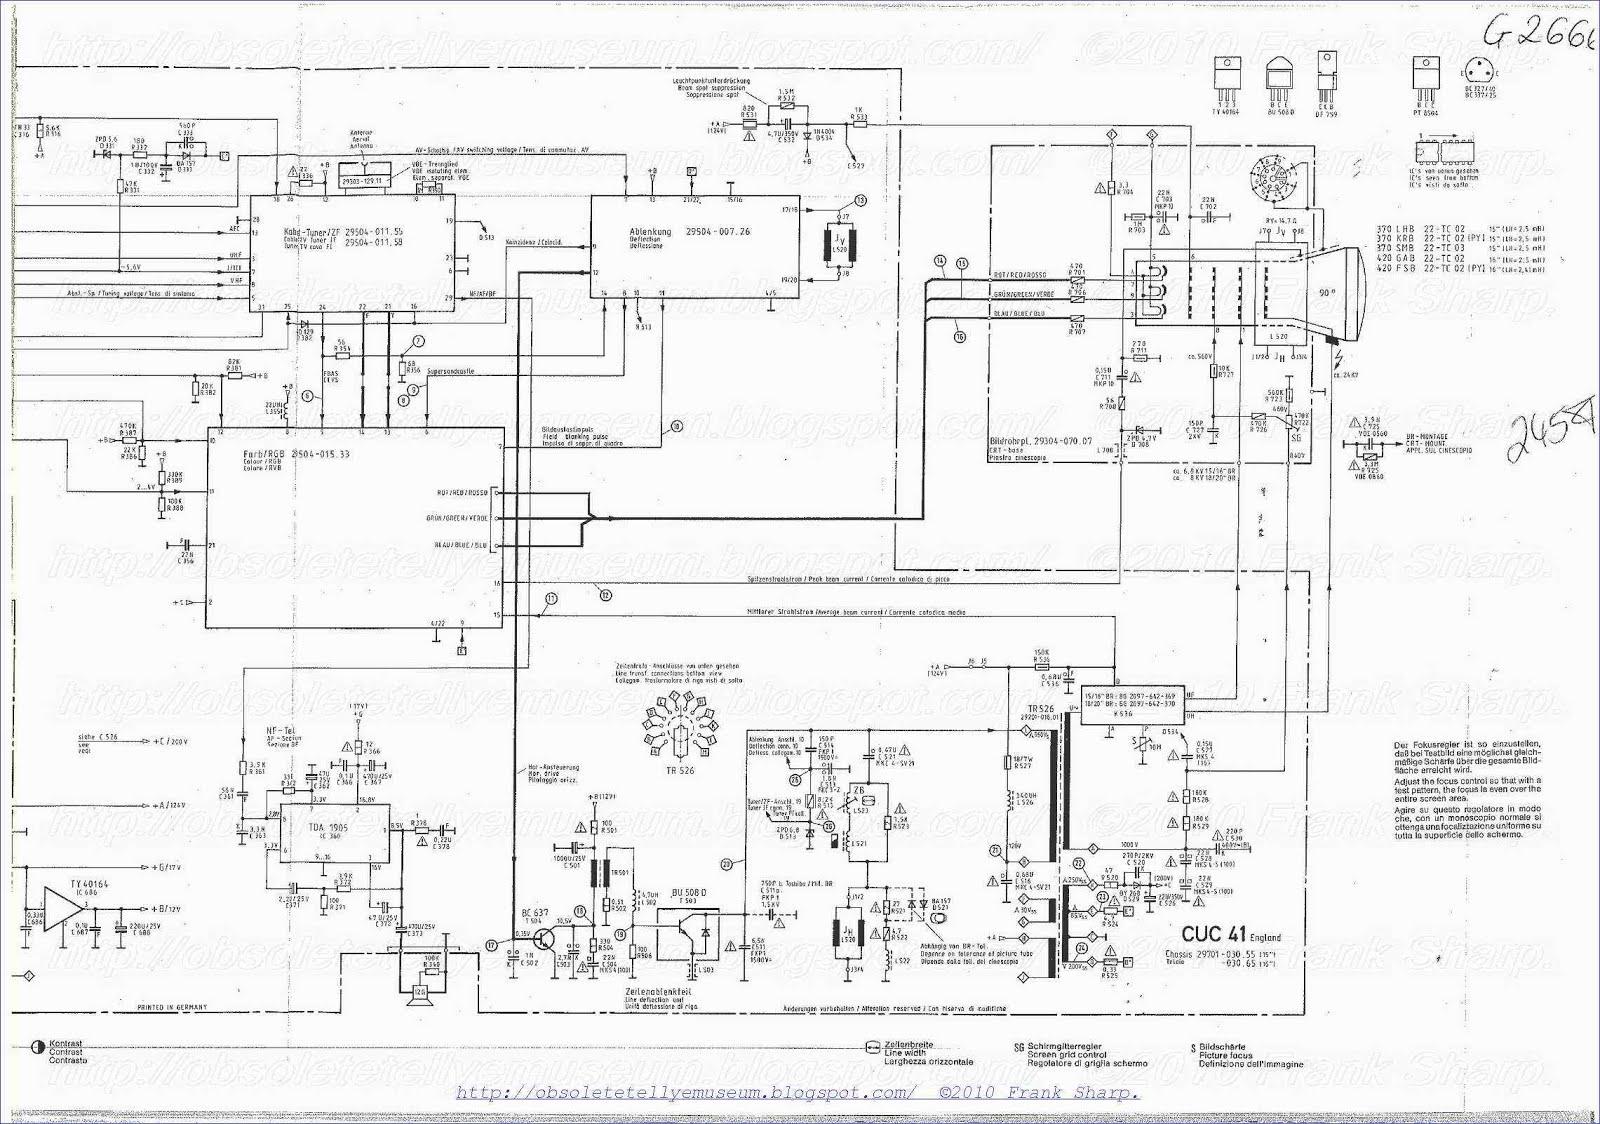 obsolete technology tellye    grundig super color c2205